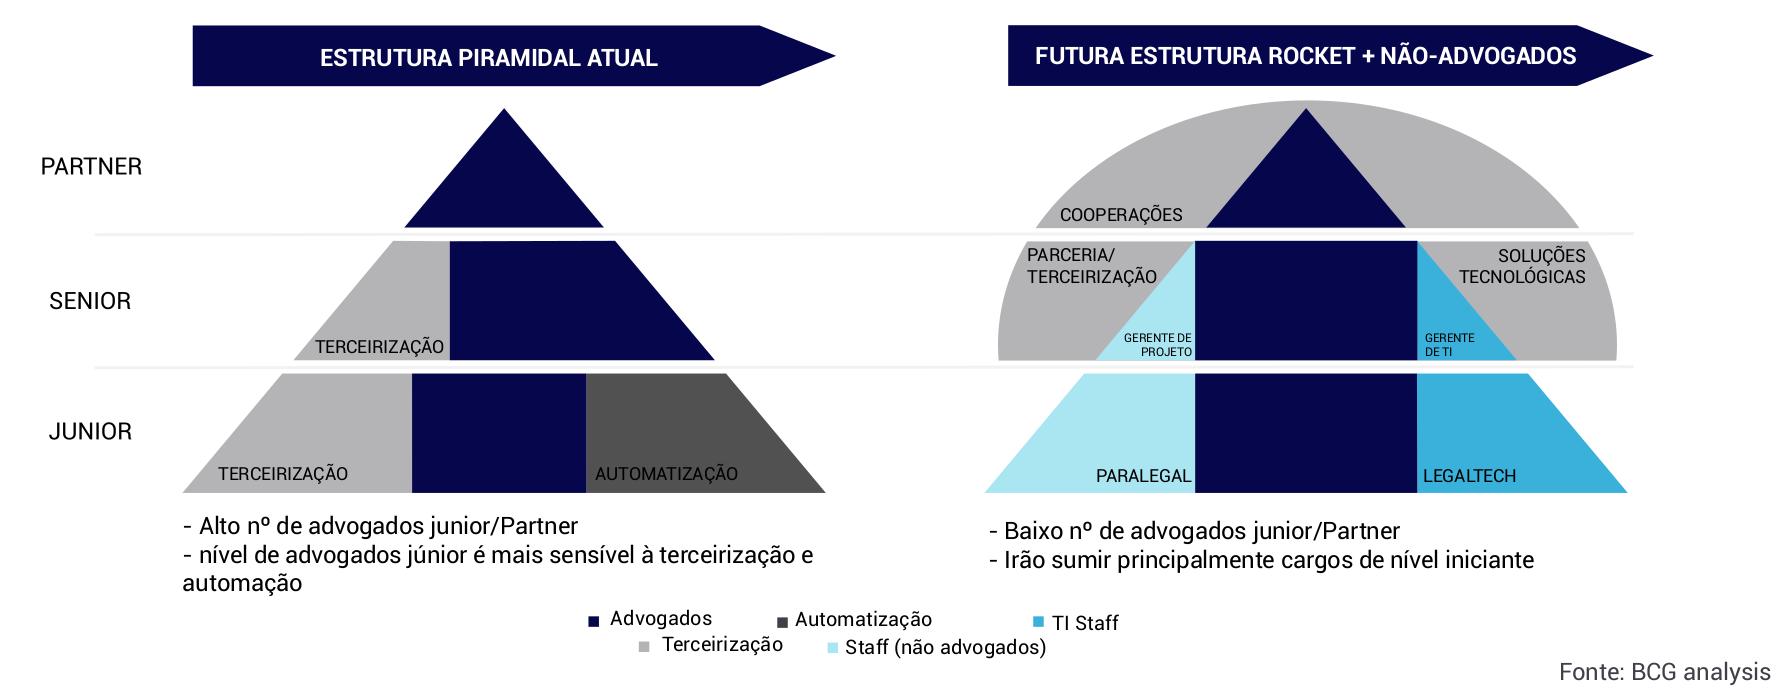 Estrutura dos serviços jurídicos